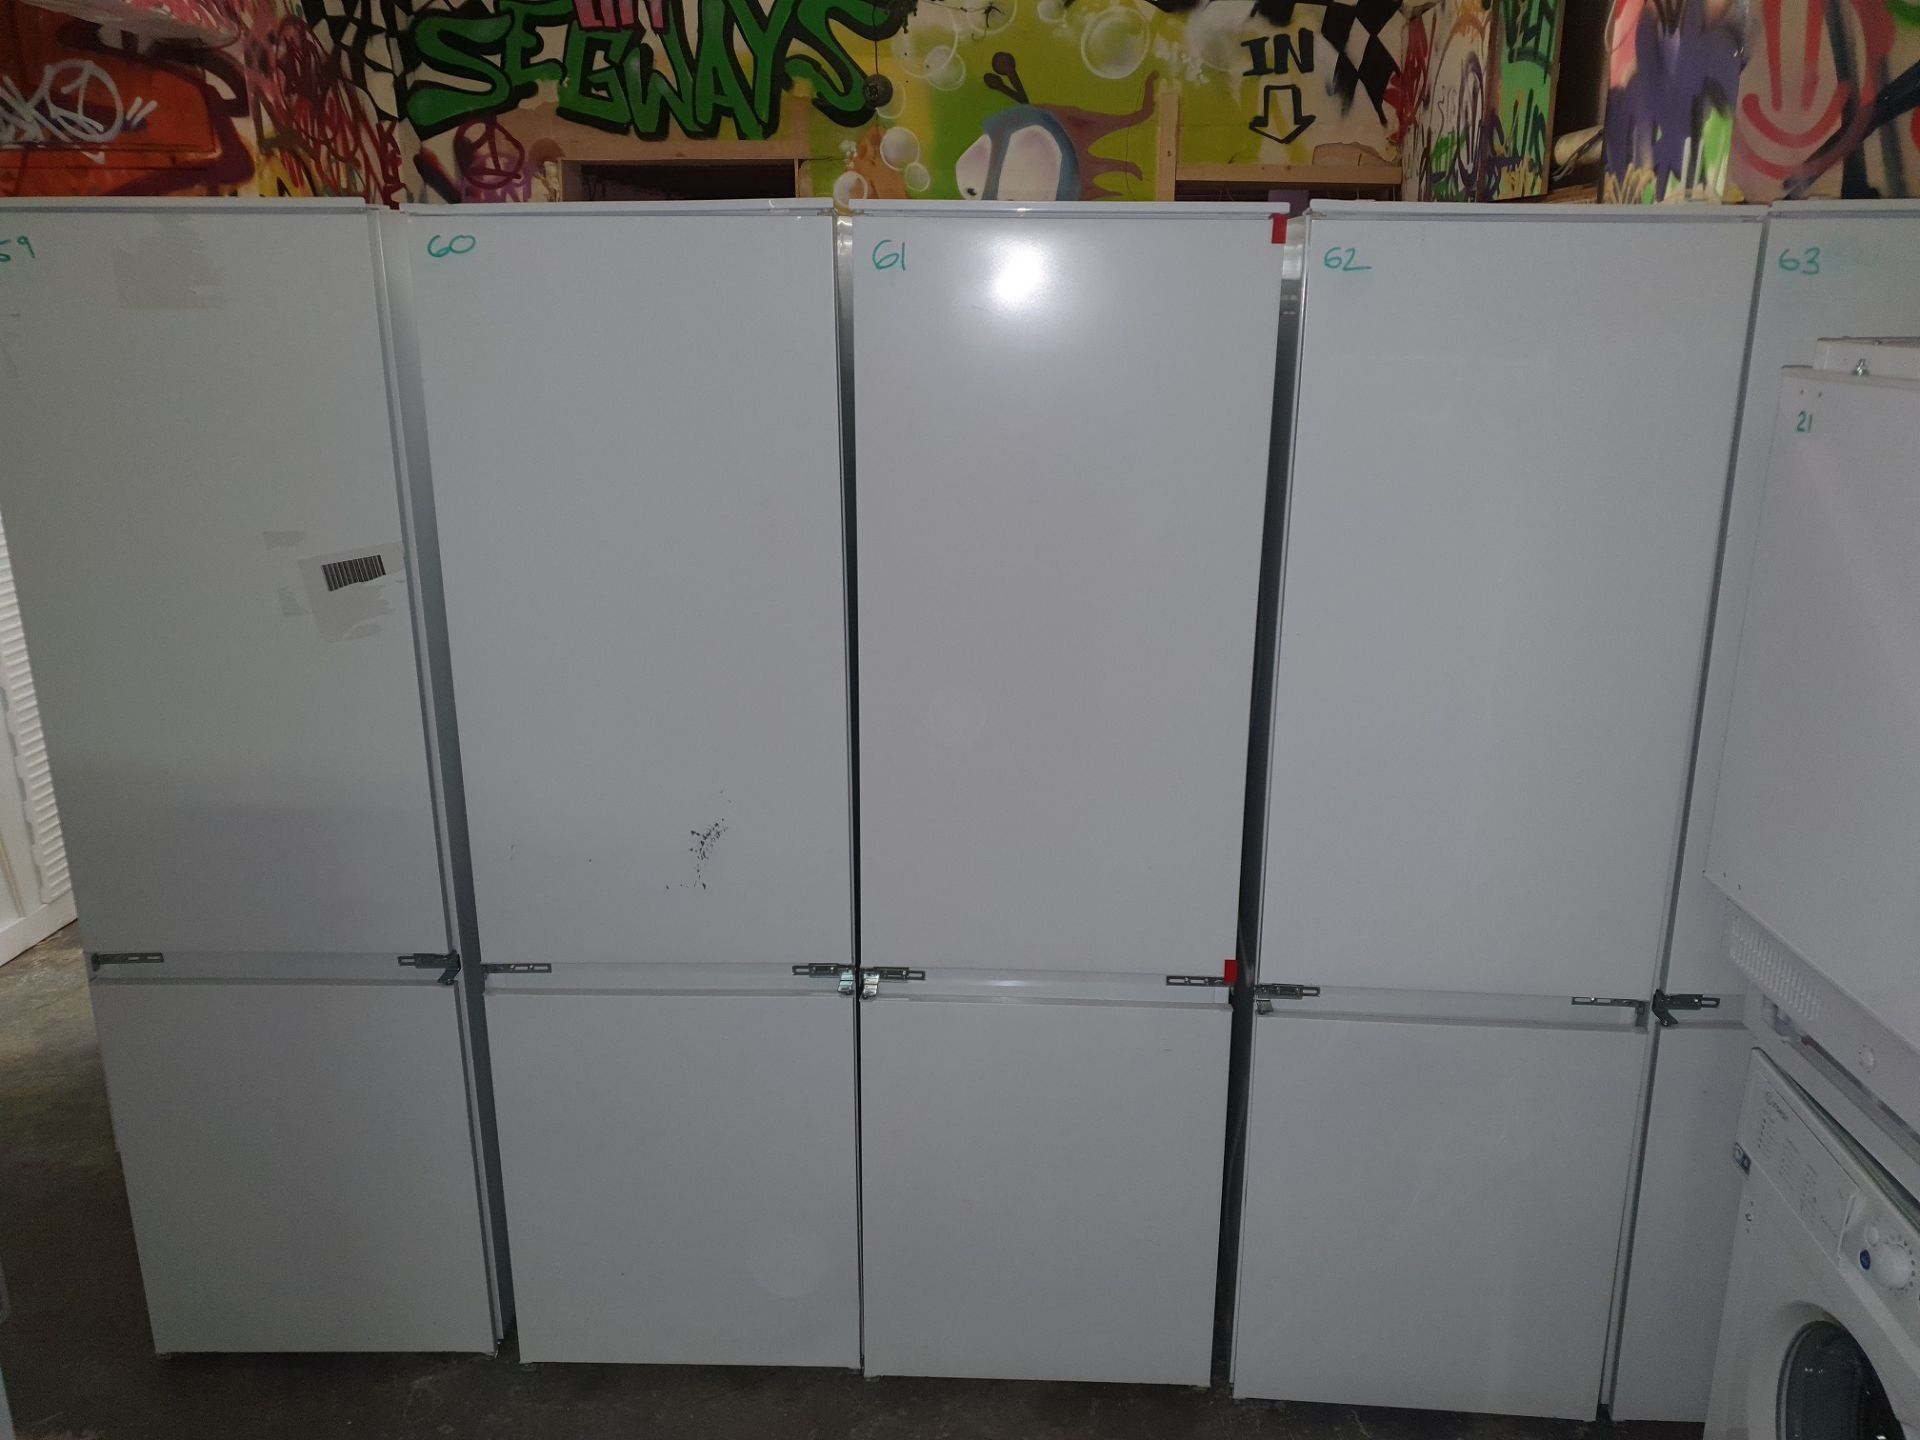 NEW/GRADED AND UNPACKAGED Zanussi ZBB27450SV Integrated 50/50 Fridge Freezer (Brand new slight - Image 2 of 14